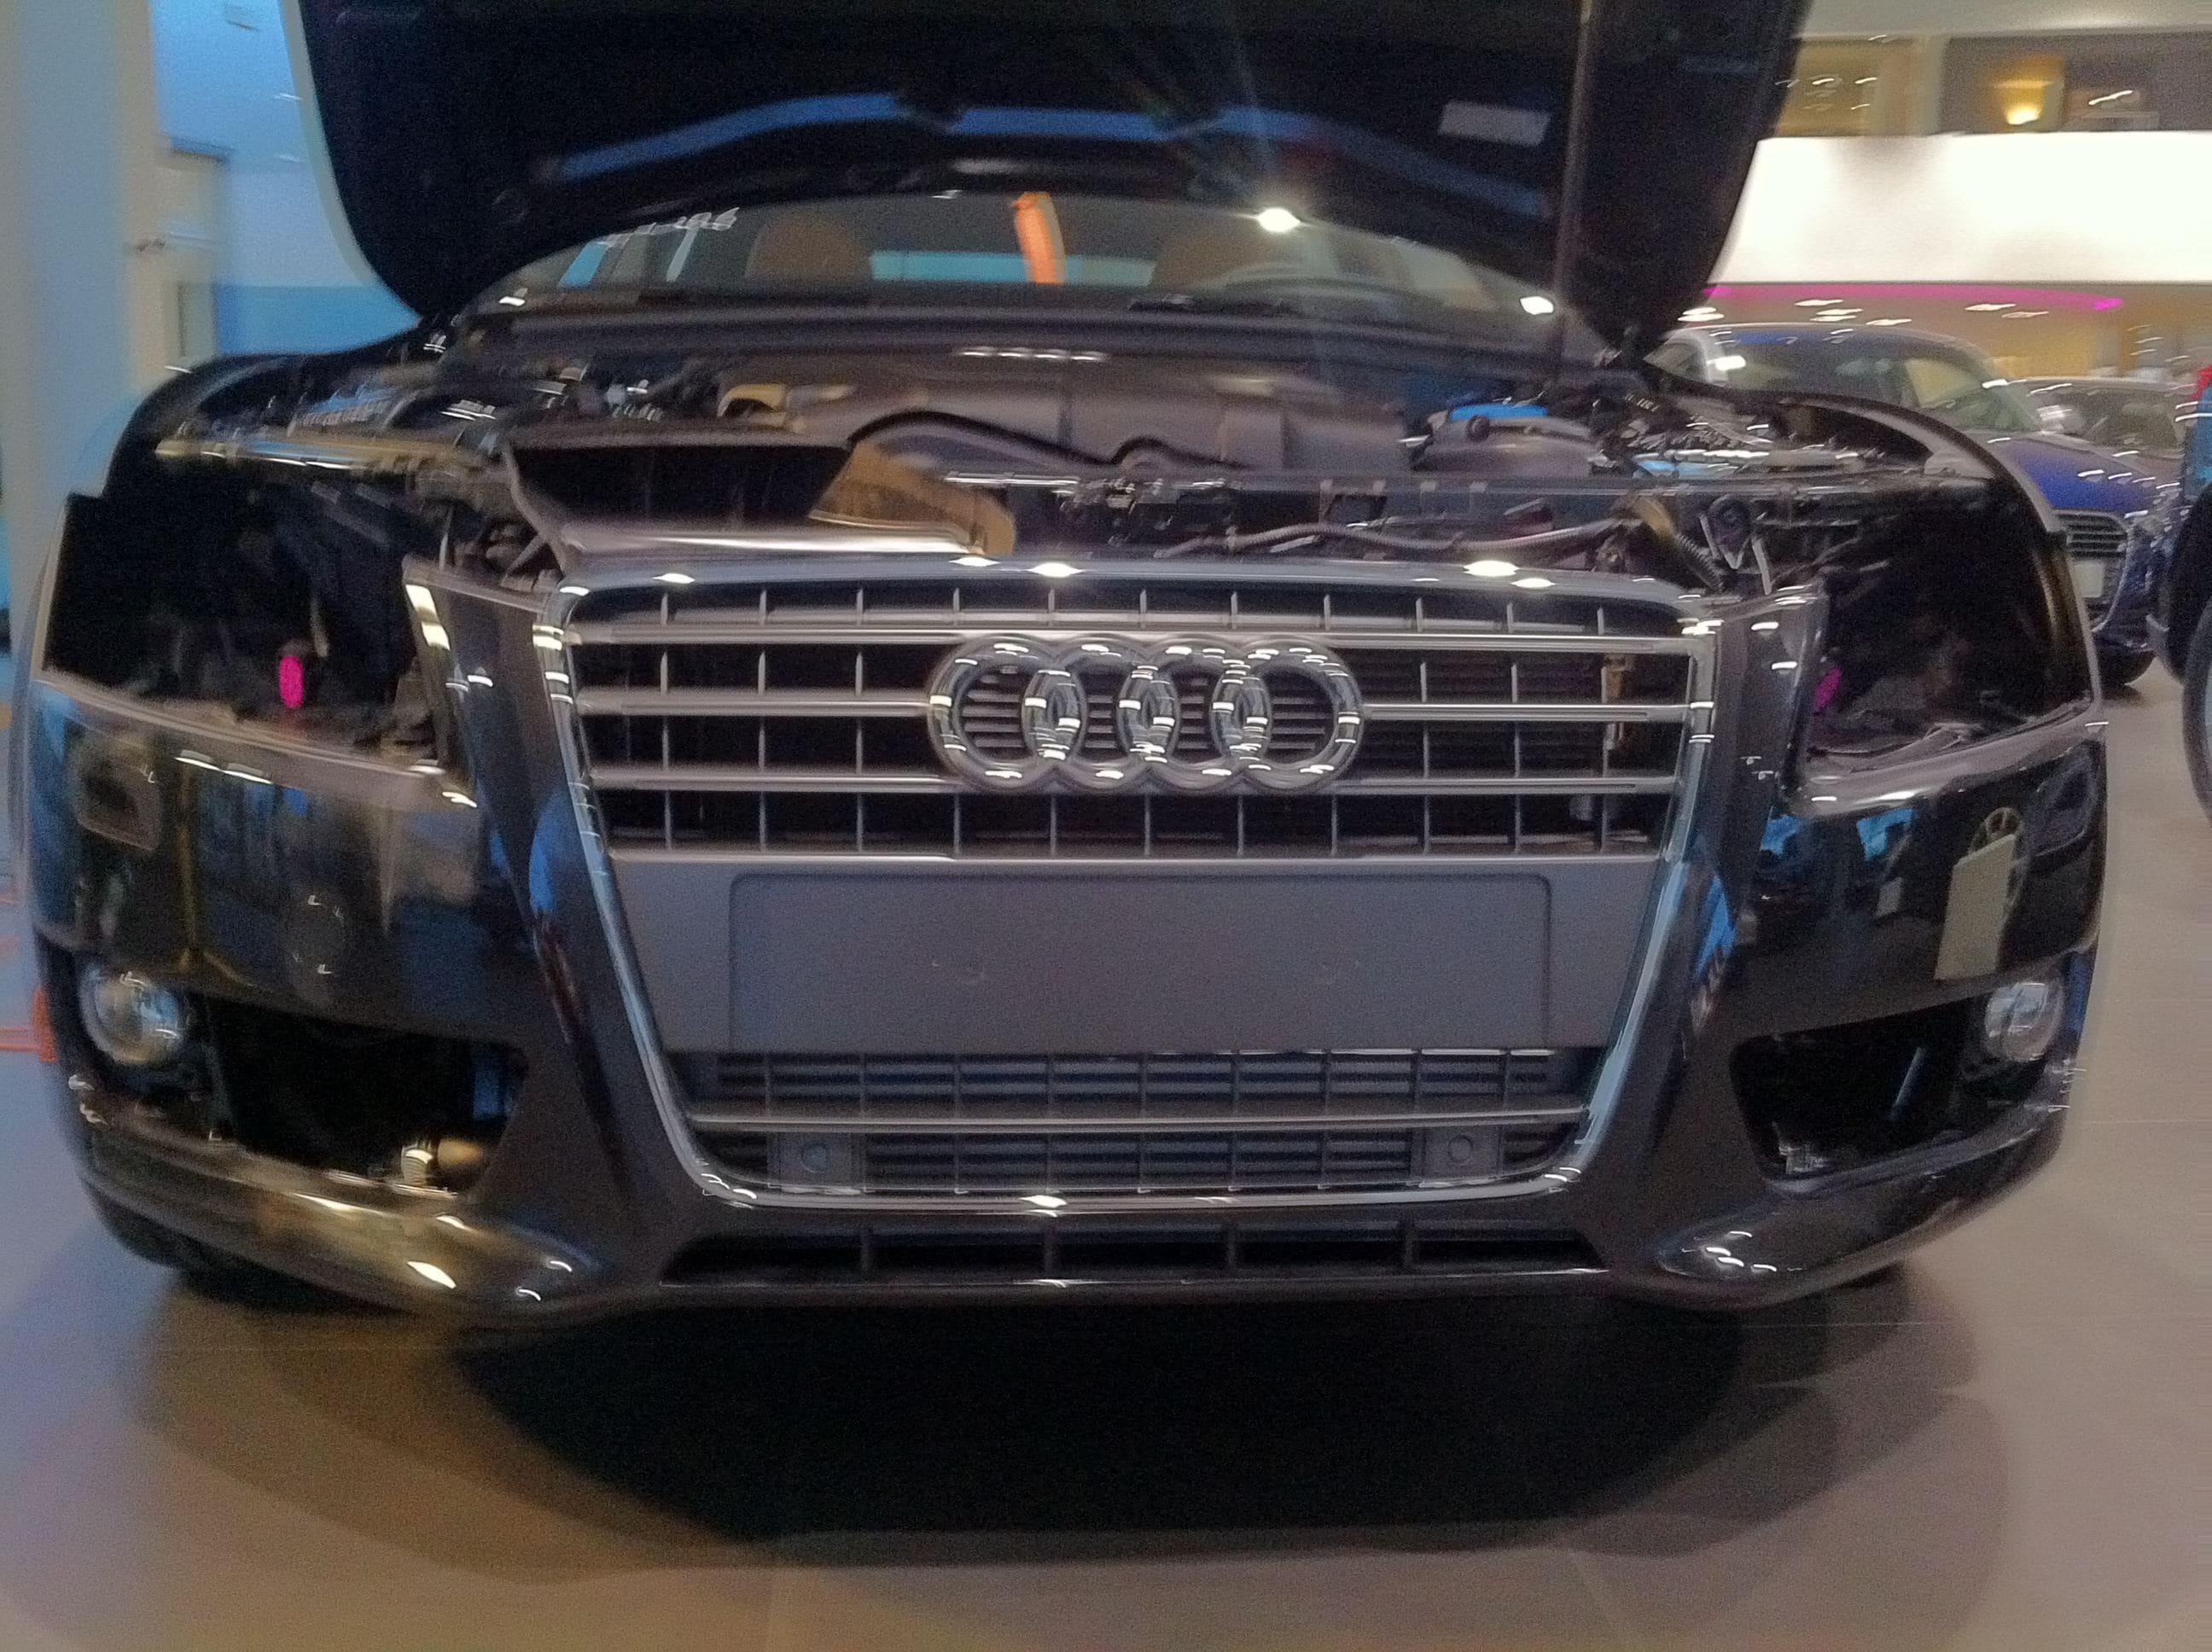 Audi A5 Sportback met Mat Grijze Wrap, Carwrapping door Wrapmyride.nu Foto-nr:4770, ©2021